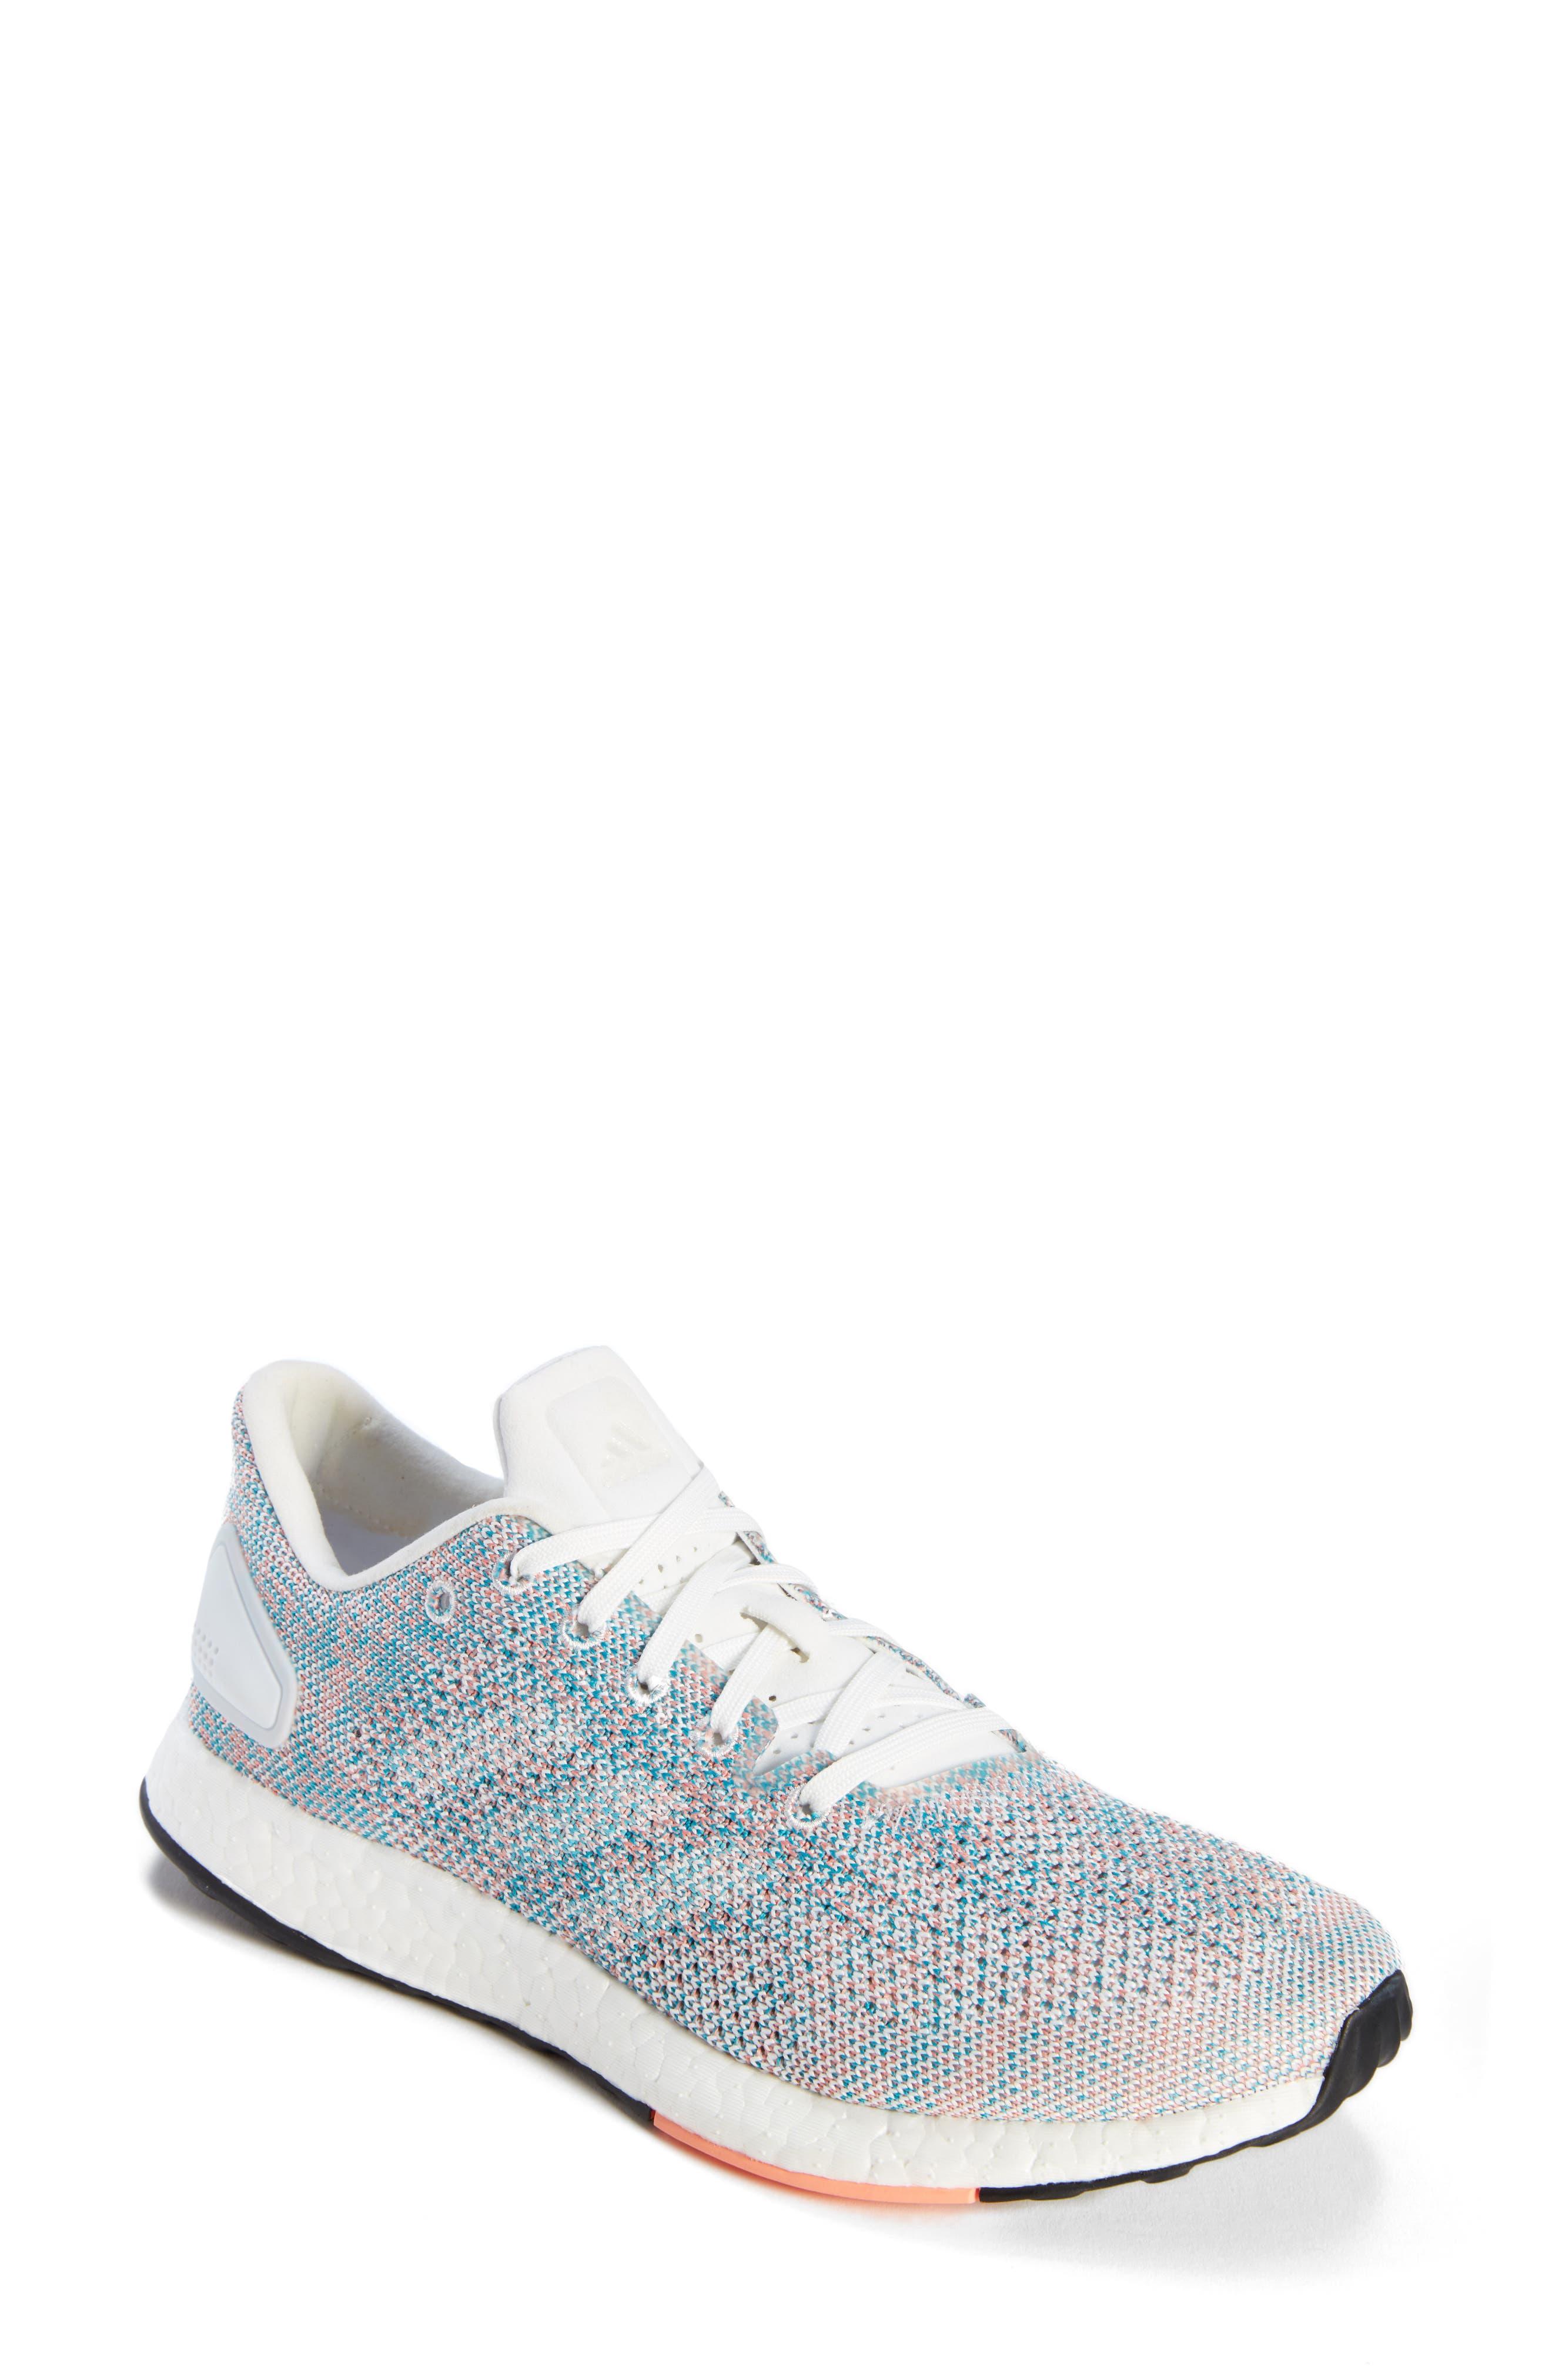 PureBoost DPR Running Shoe,                         Main,                         color, 100